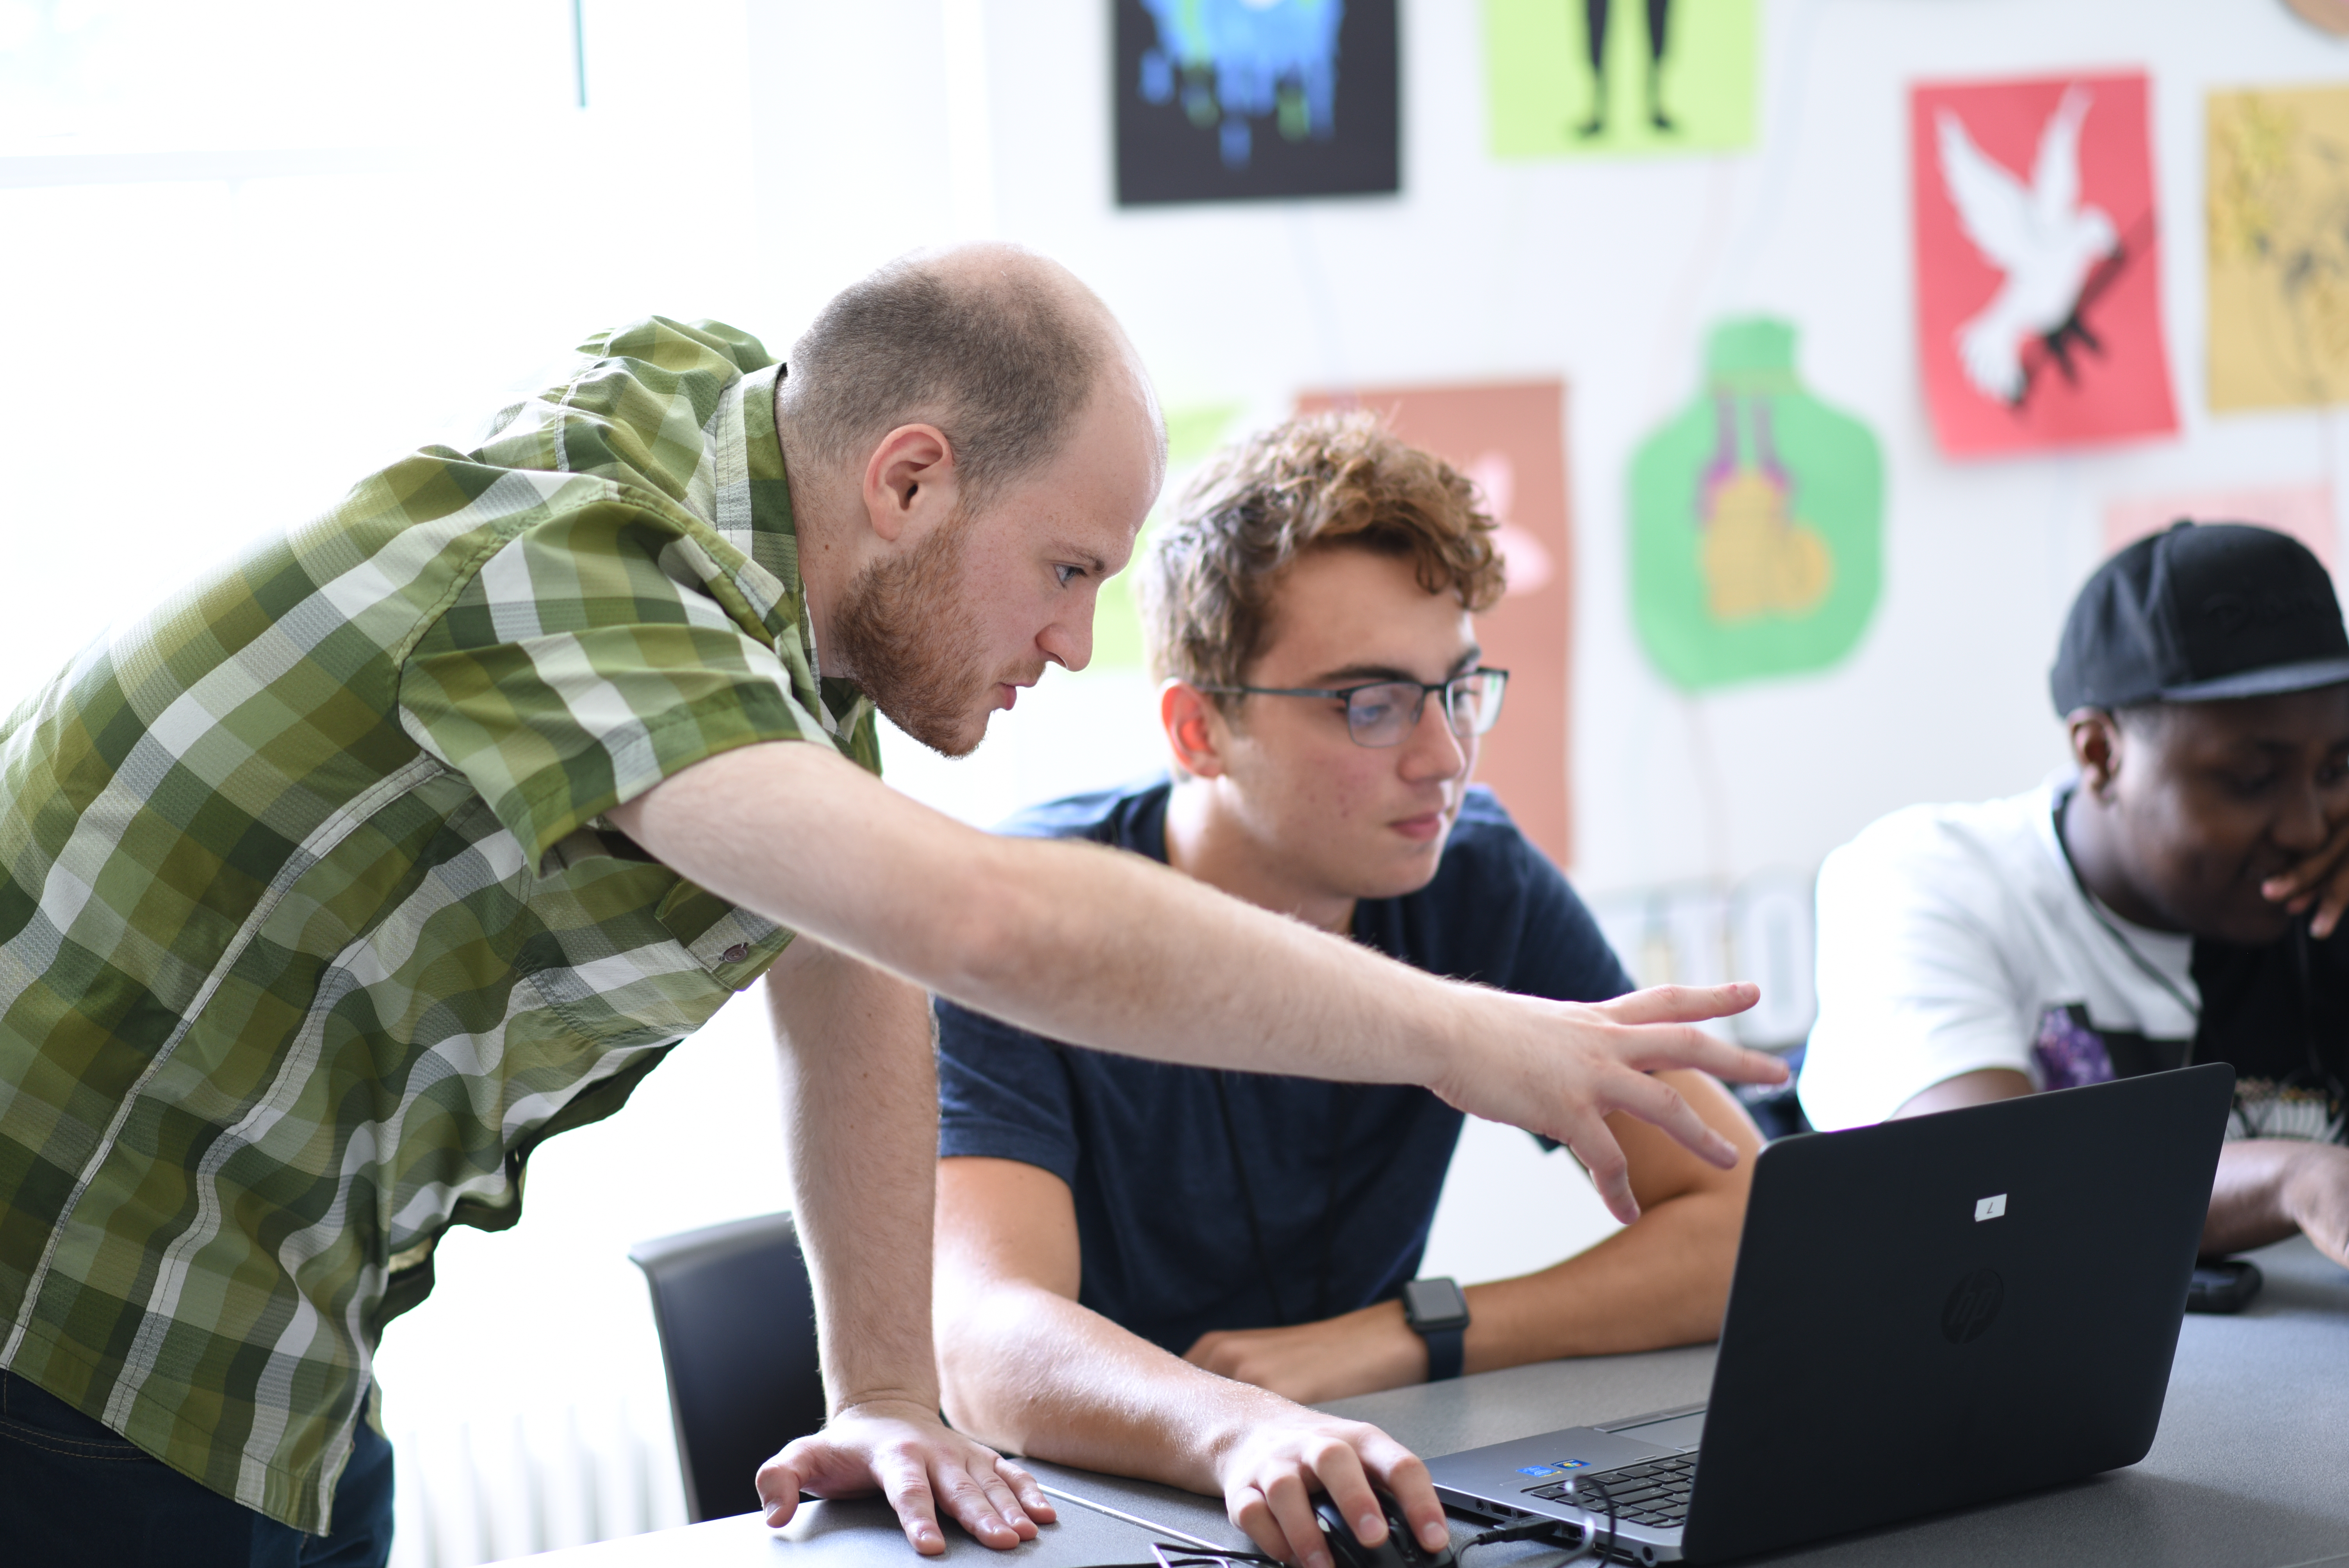 Summer Program - College Experience | Adelphi University Summer Pre-College Programs